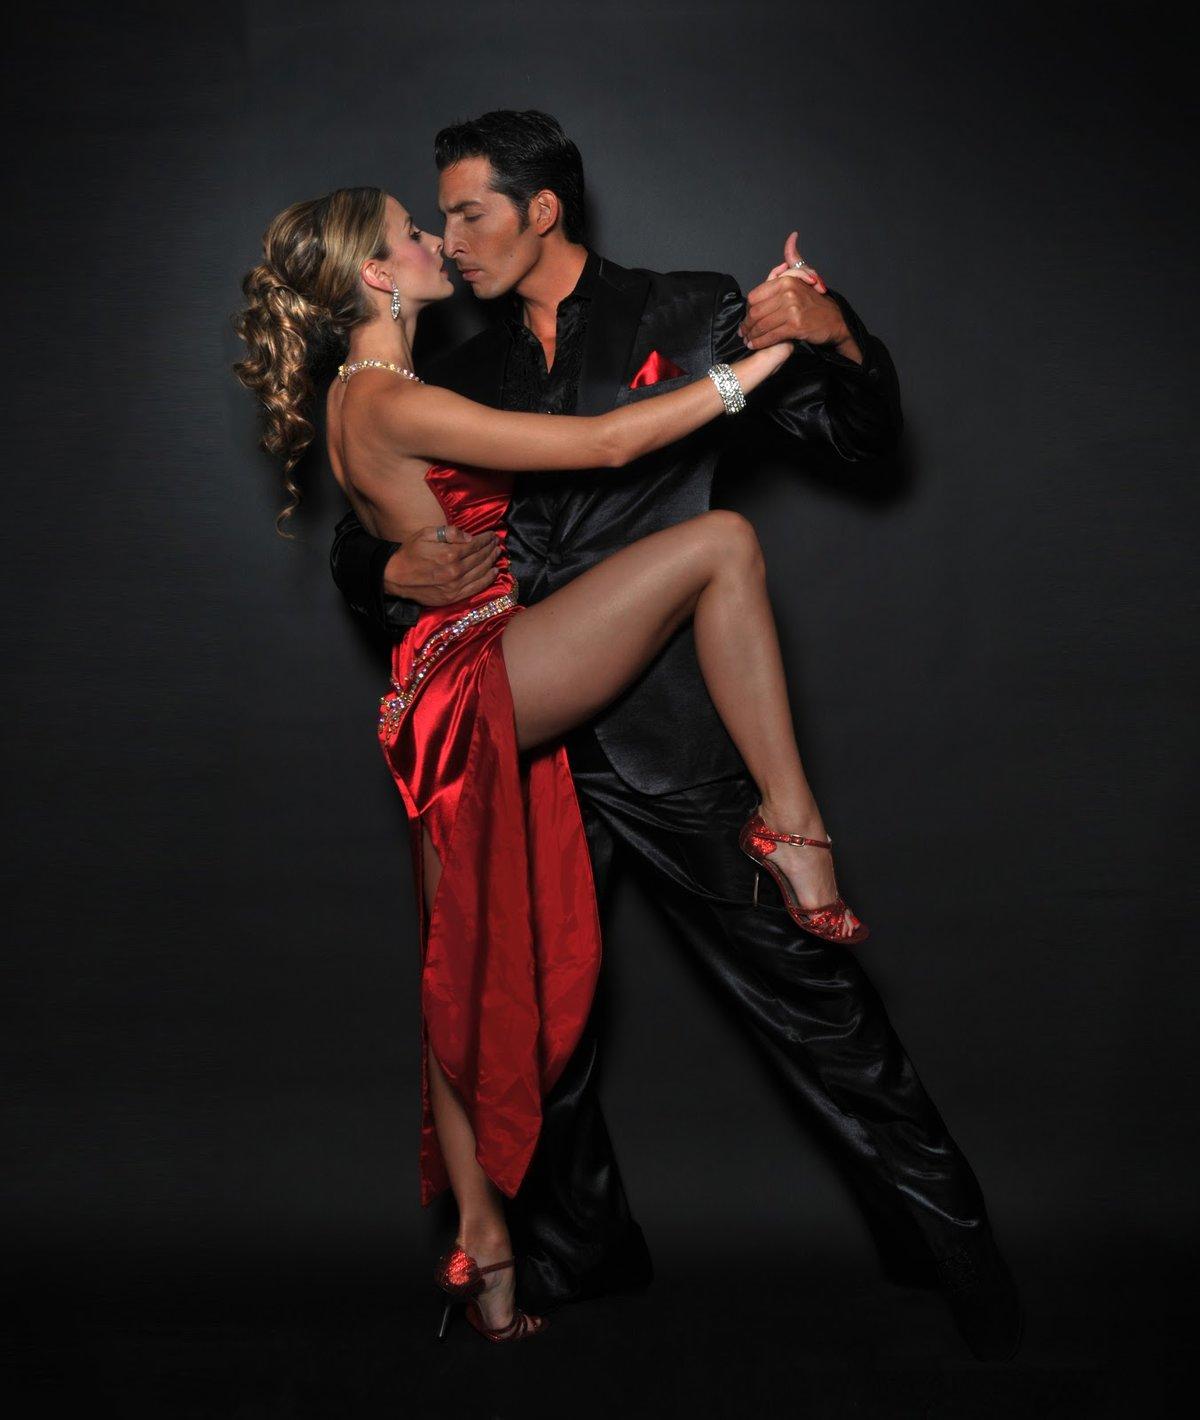 картинке любимой танец фото